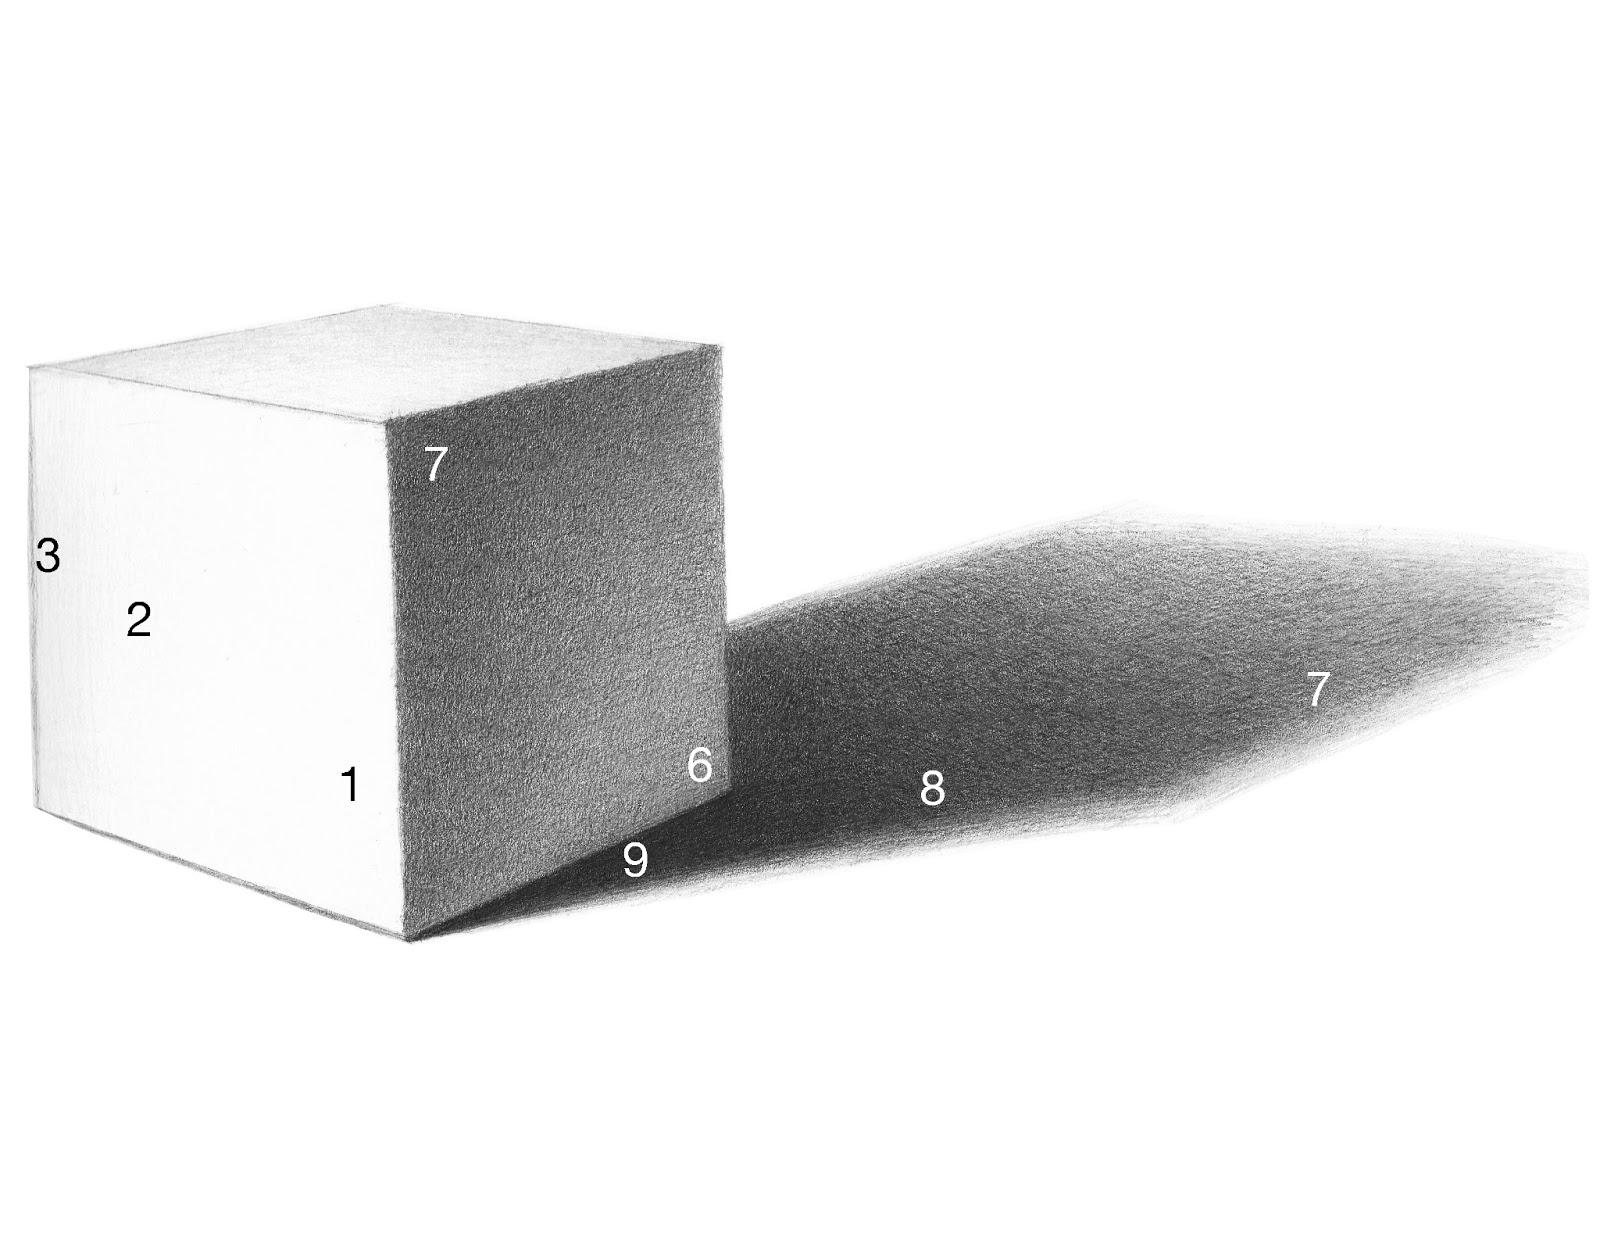 Rubik to the Rescue: The Rubik's Cube Engages ... - Edutopia